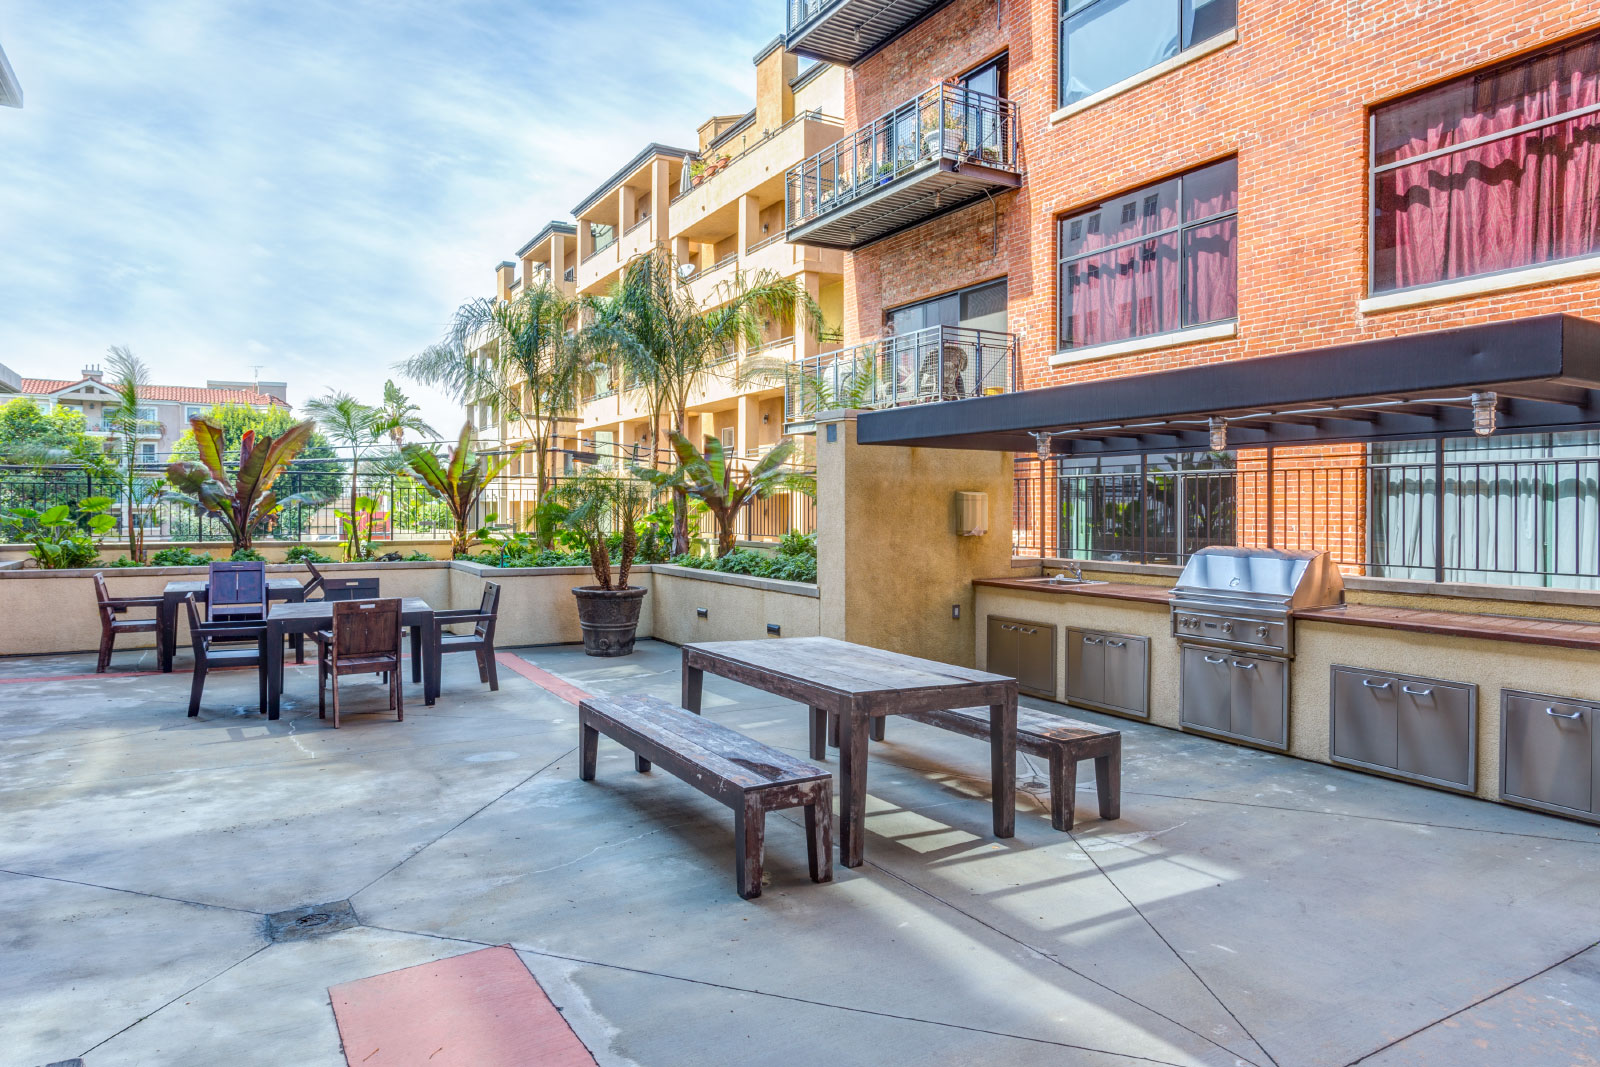 patio-1_12844274683_o.jpg